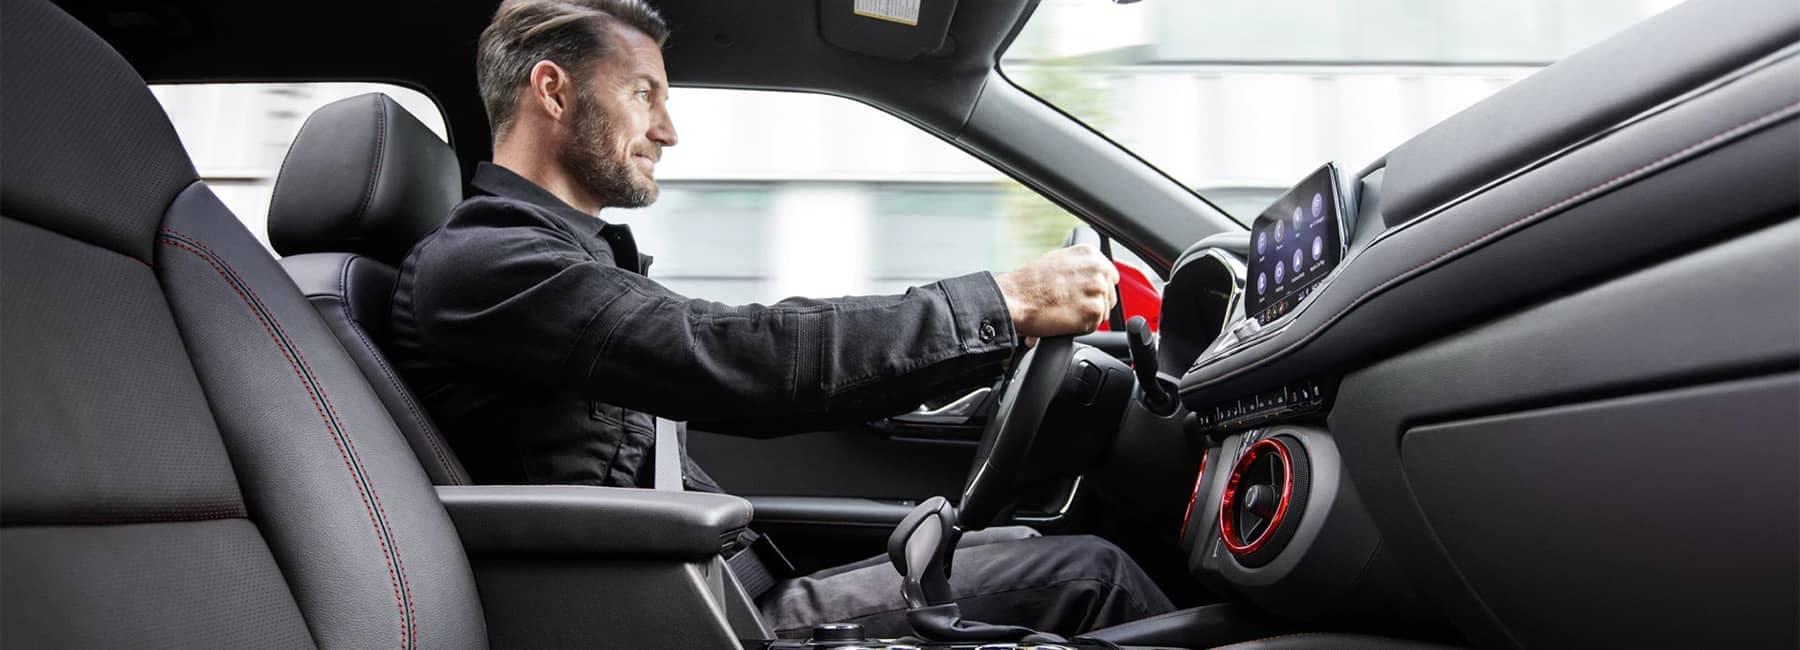 Man in Drivers Seat of 2020 Chevrolet Blazer Jet Black Leather Interior